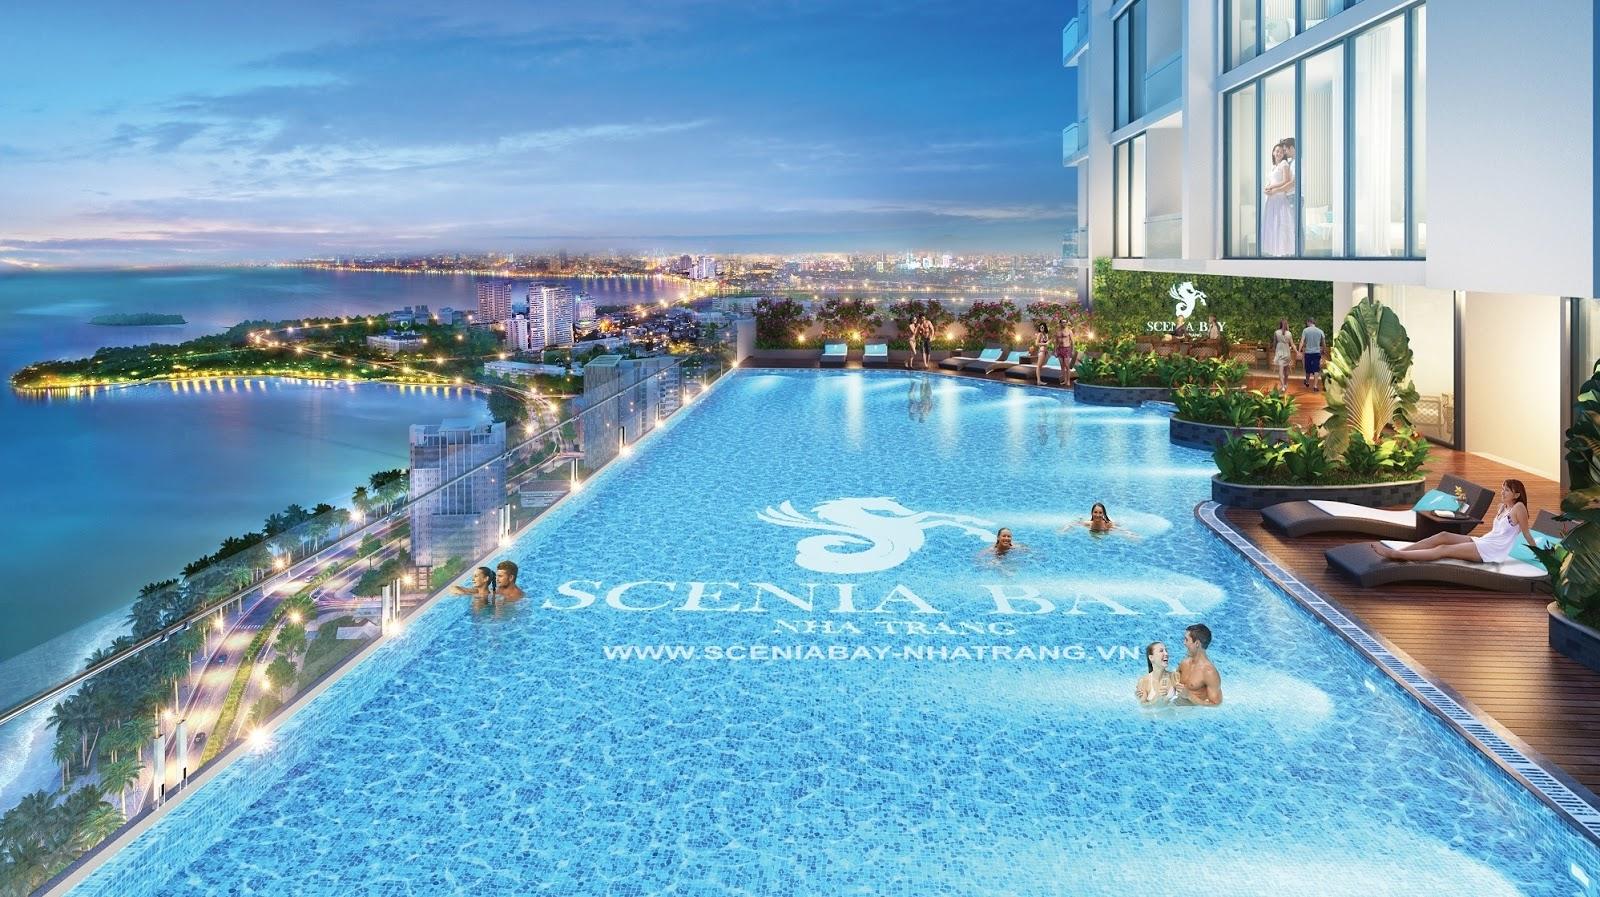 Bể bơi Scenia Bay Nha Trang